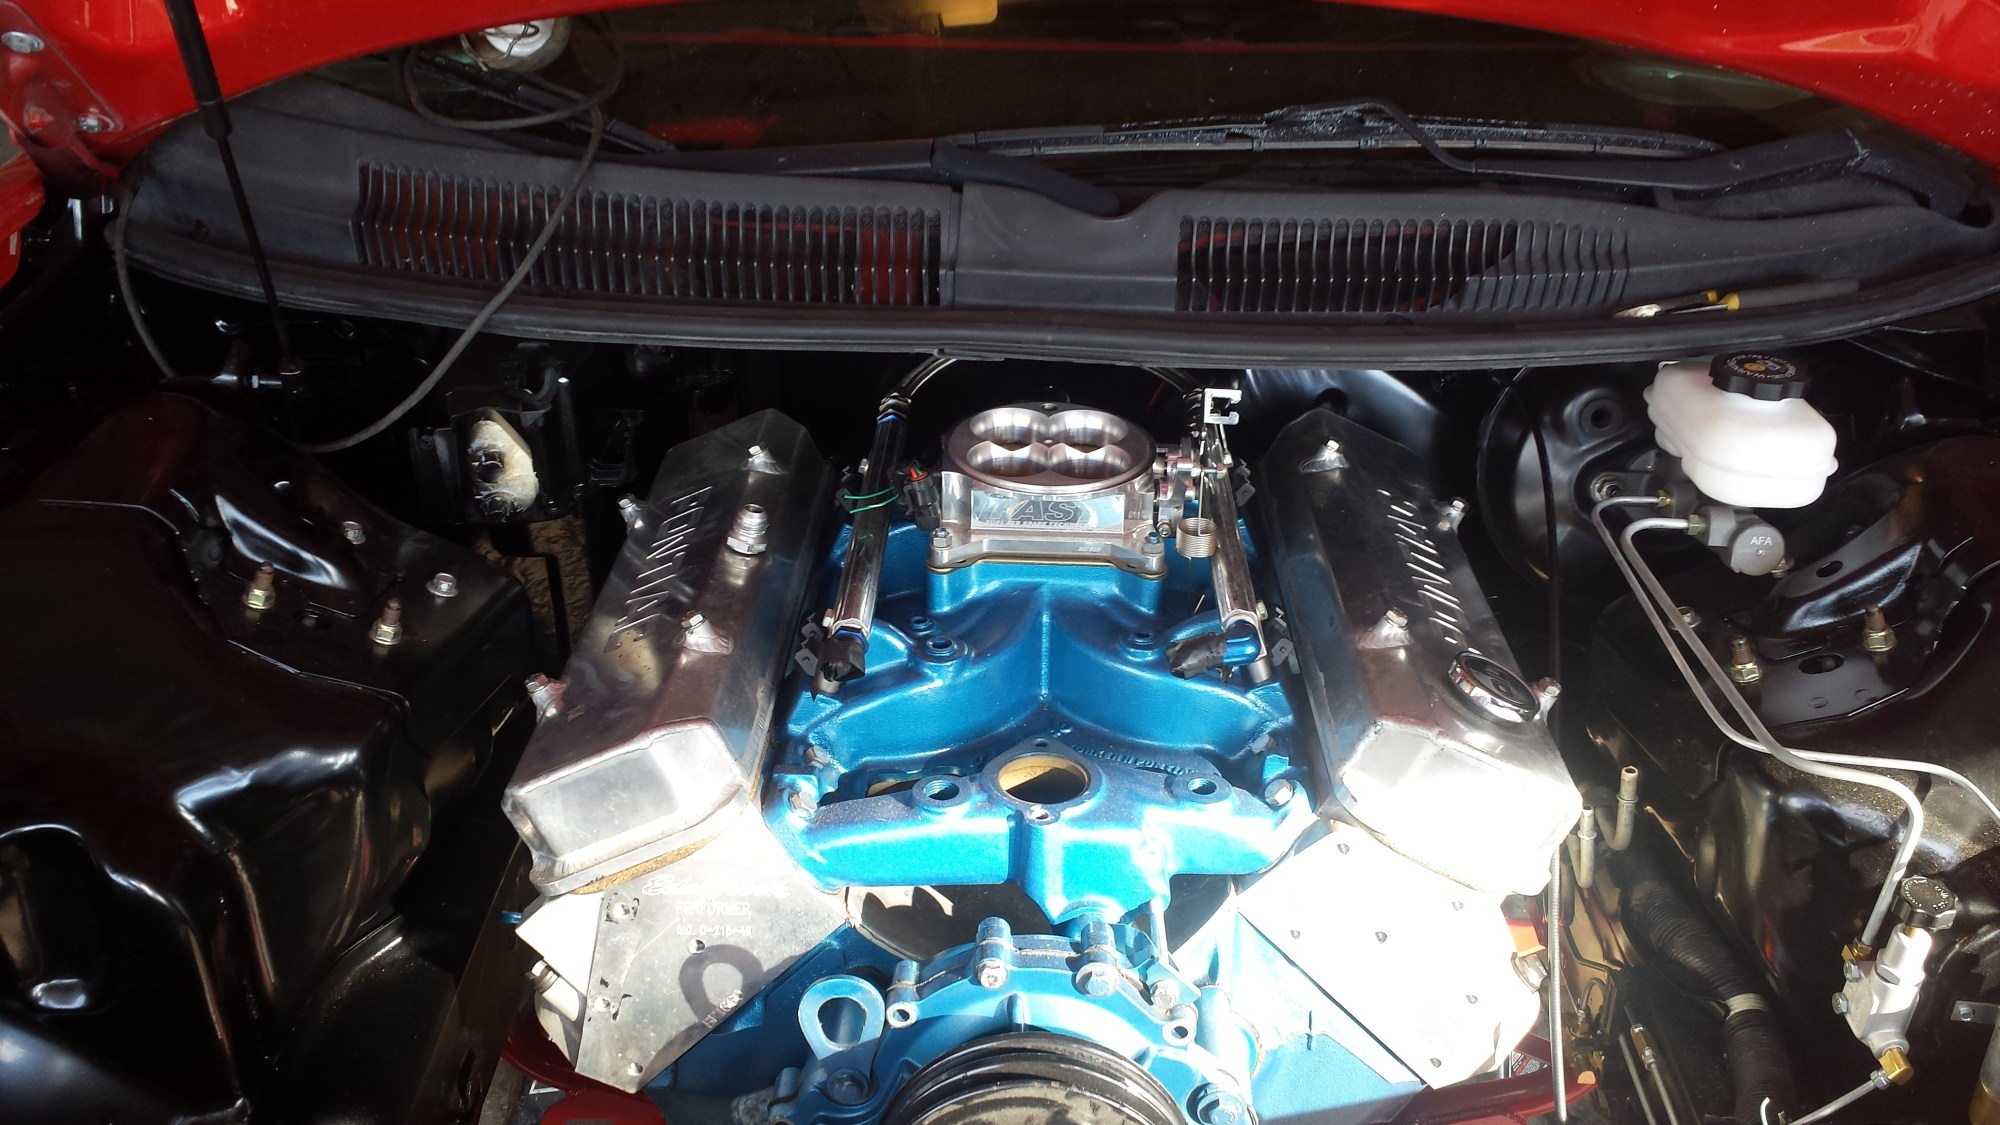 hight resolution of 1998 trans am with a 462 pontiac engine 20140911 174331 1 jpg